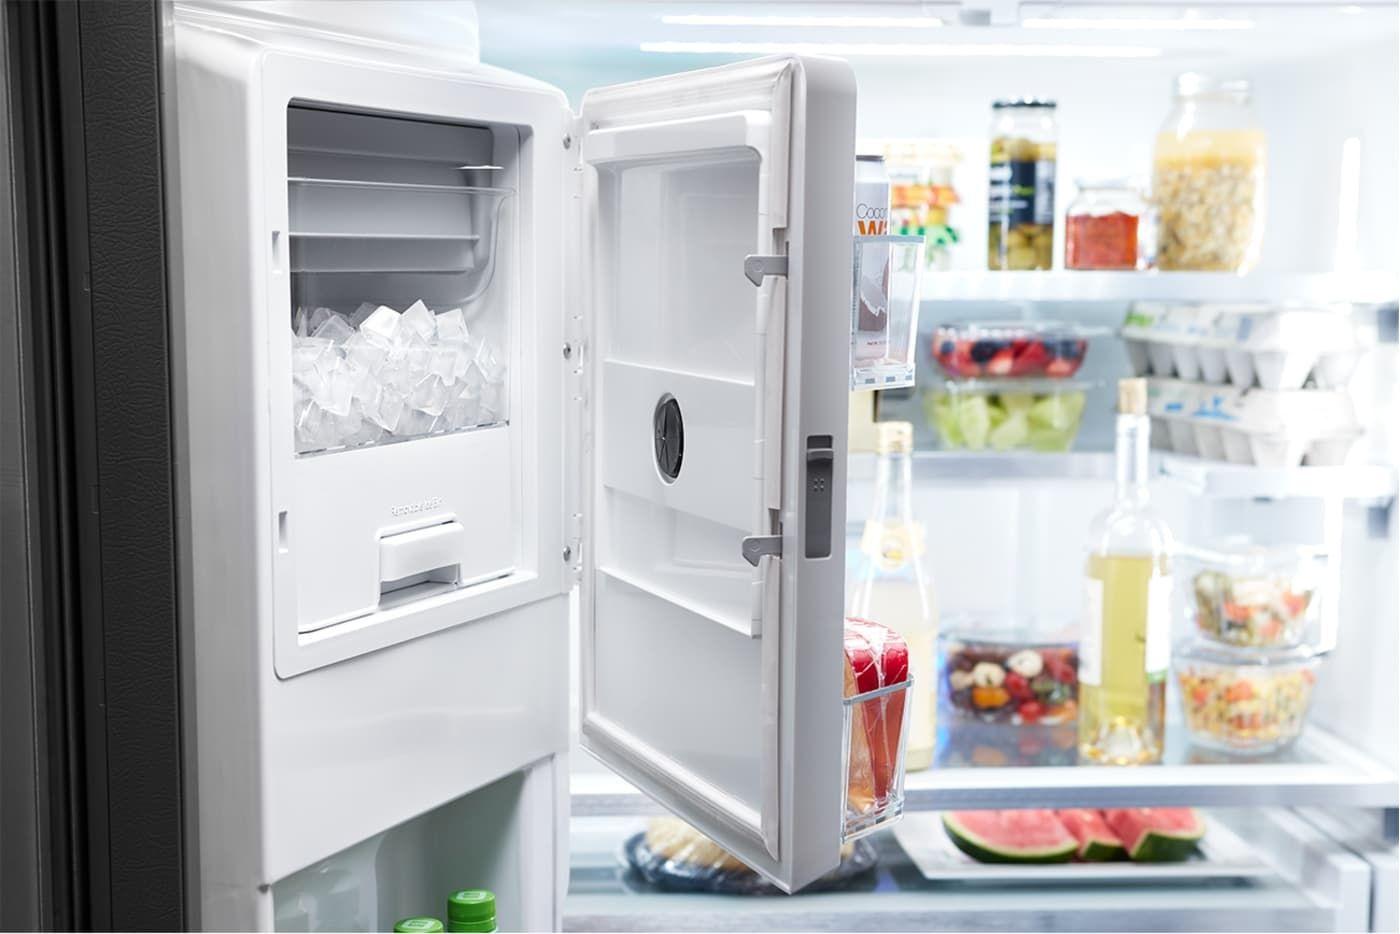 Wrf954cihz By Whirlpool French Door Refrigerators Goedekers Com French Doors French Door Refrigerators Adjustable Shelving